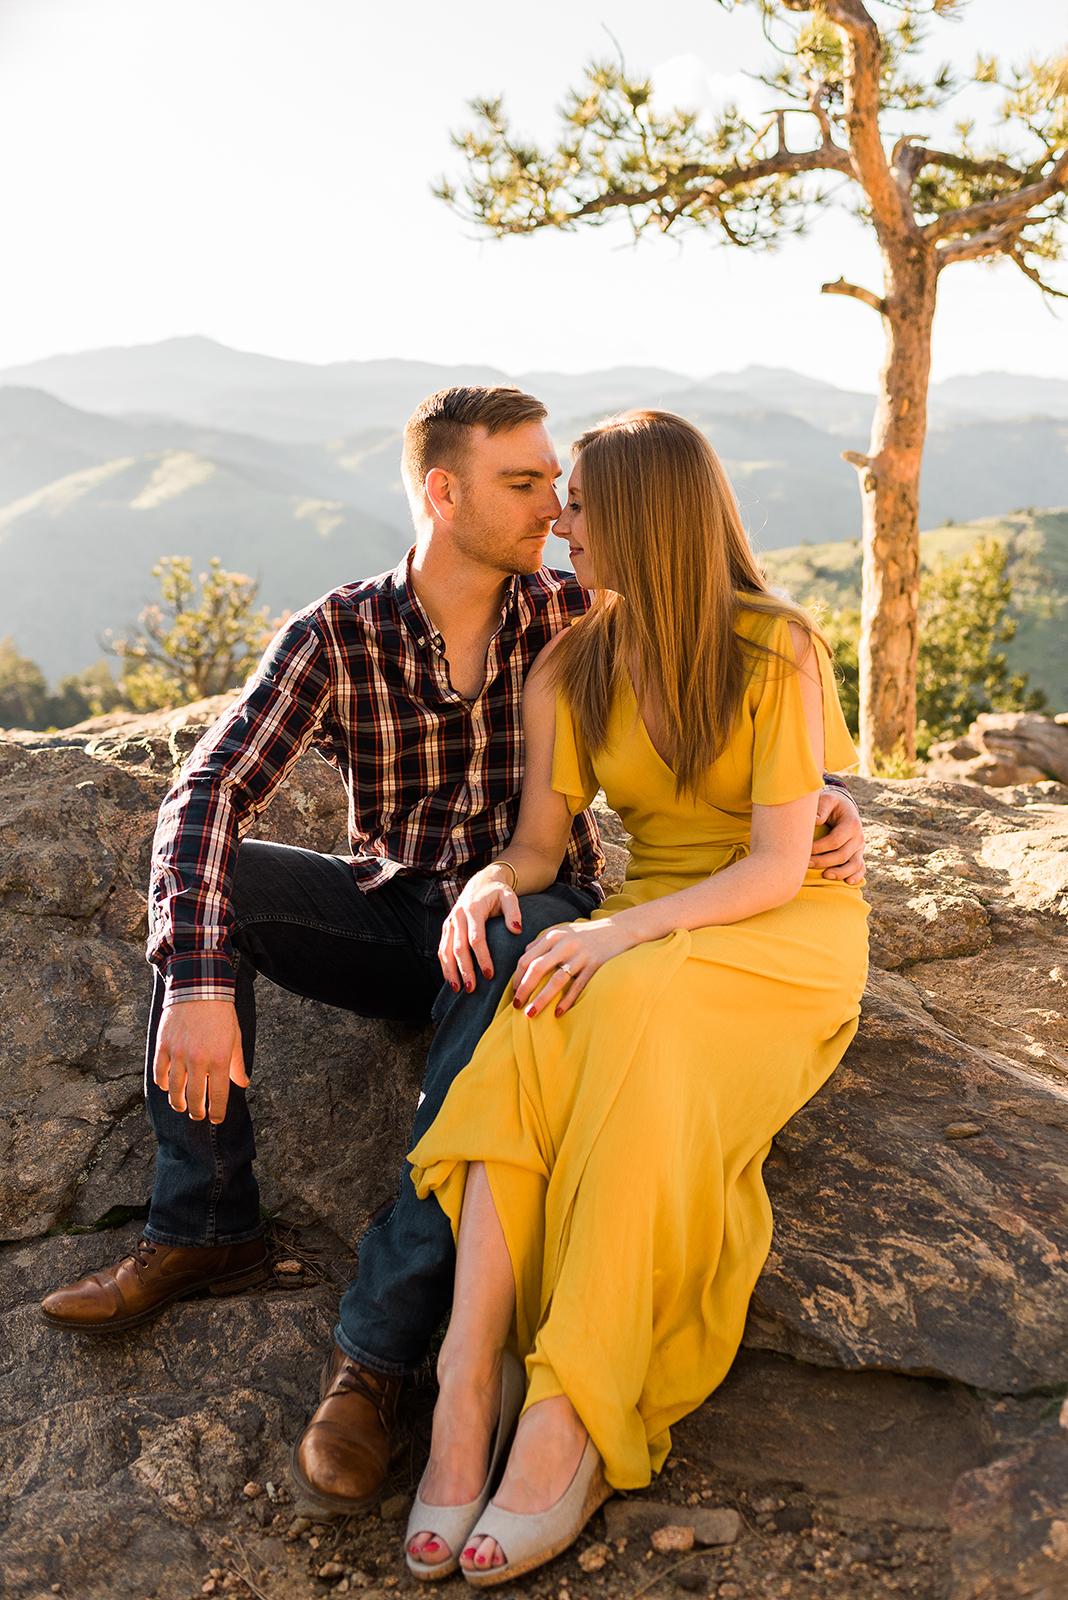 lookout-mountain-engagement-session-denver-engagement-photographer-47.jpg